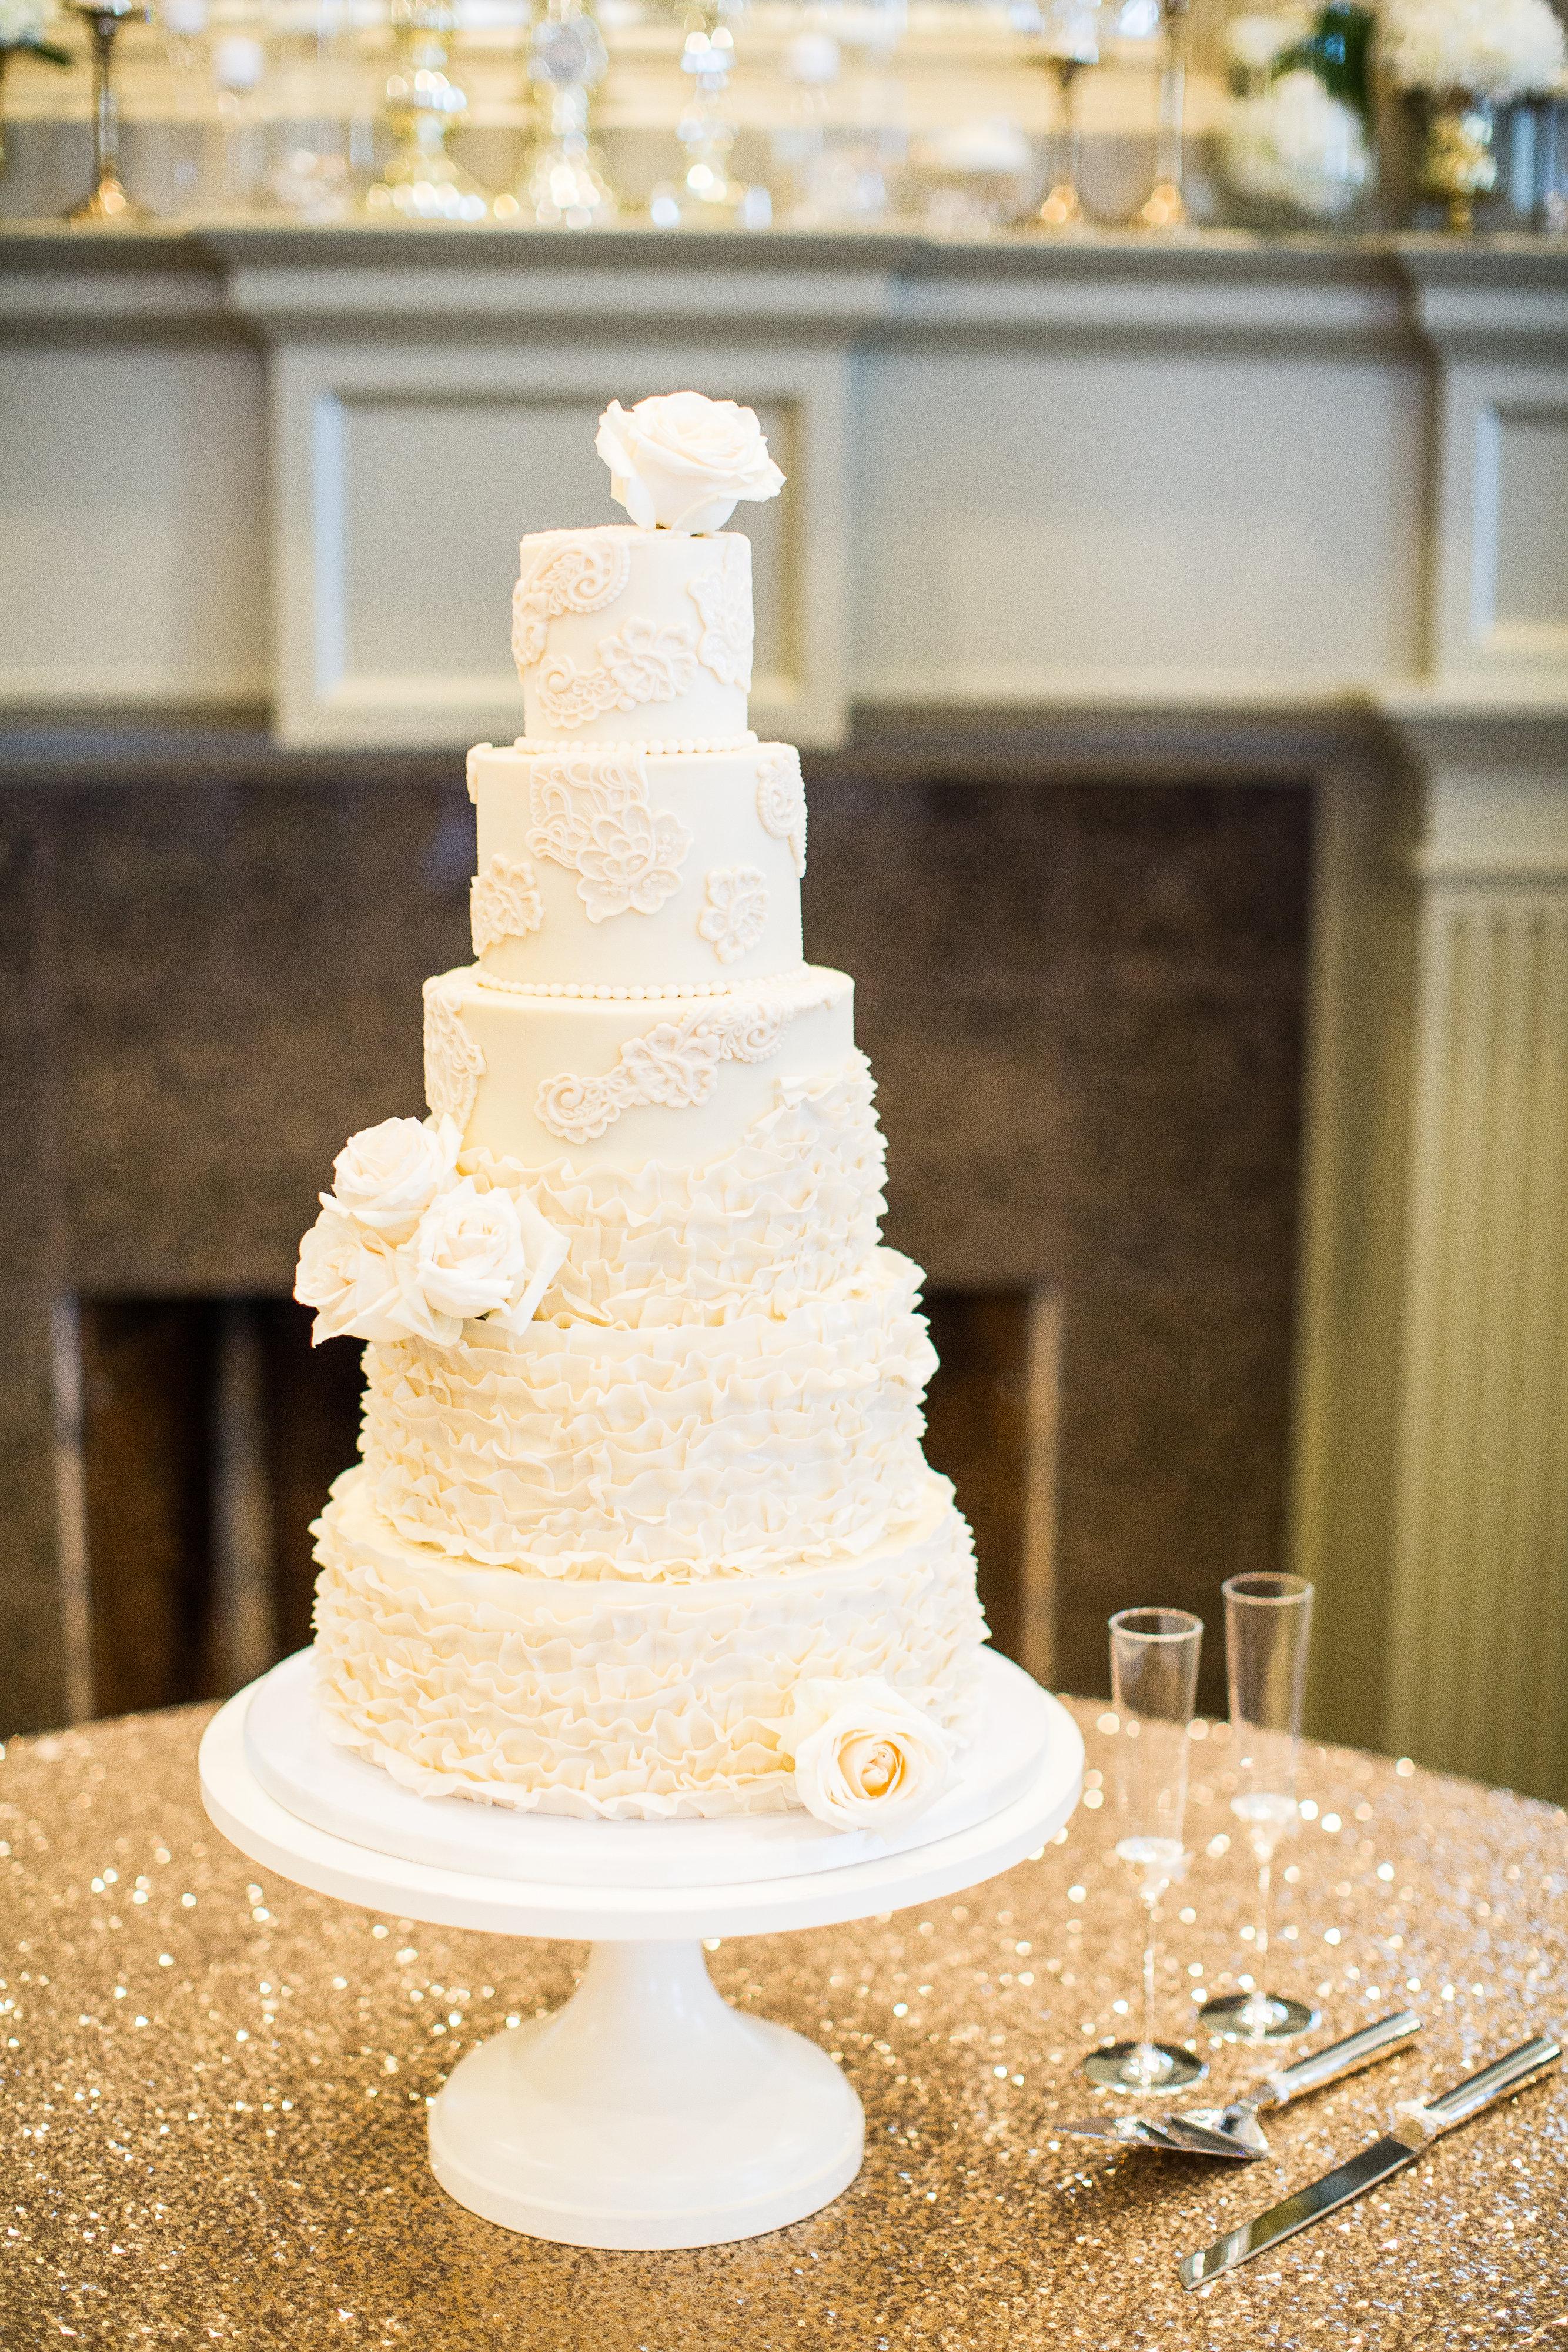 Buttercream and fondant ruffle wedding cake, buttercream wedding cake, fondant ruffles, fondant buttons, gold and ivory, fondant lace